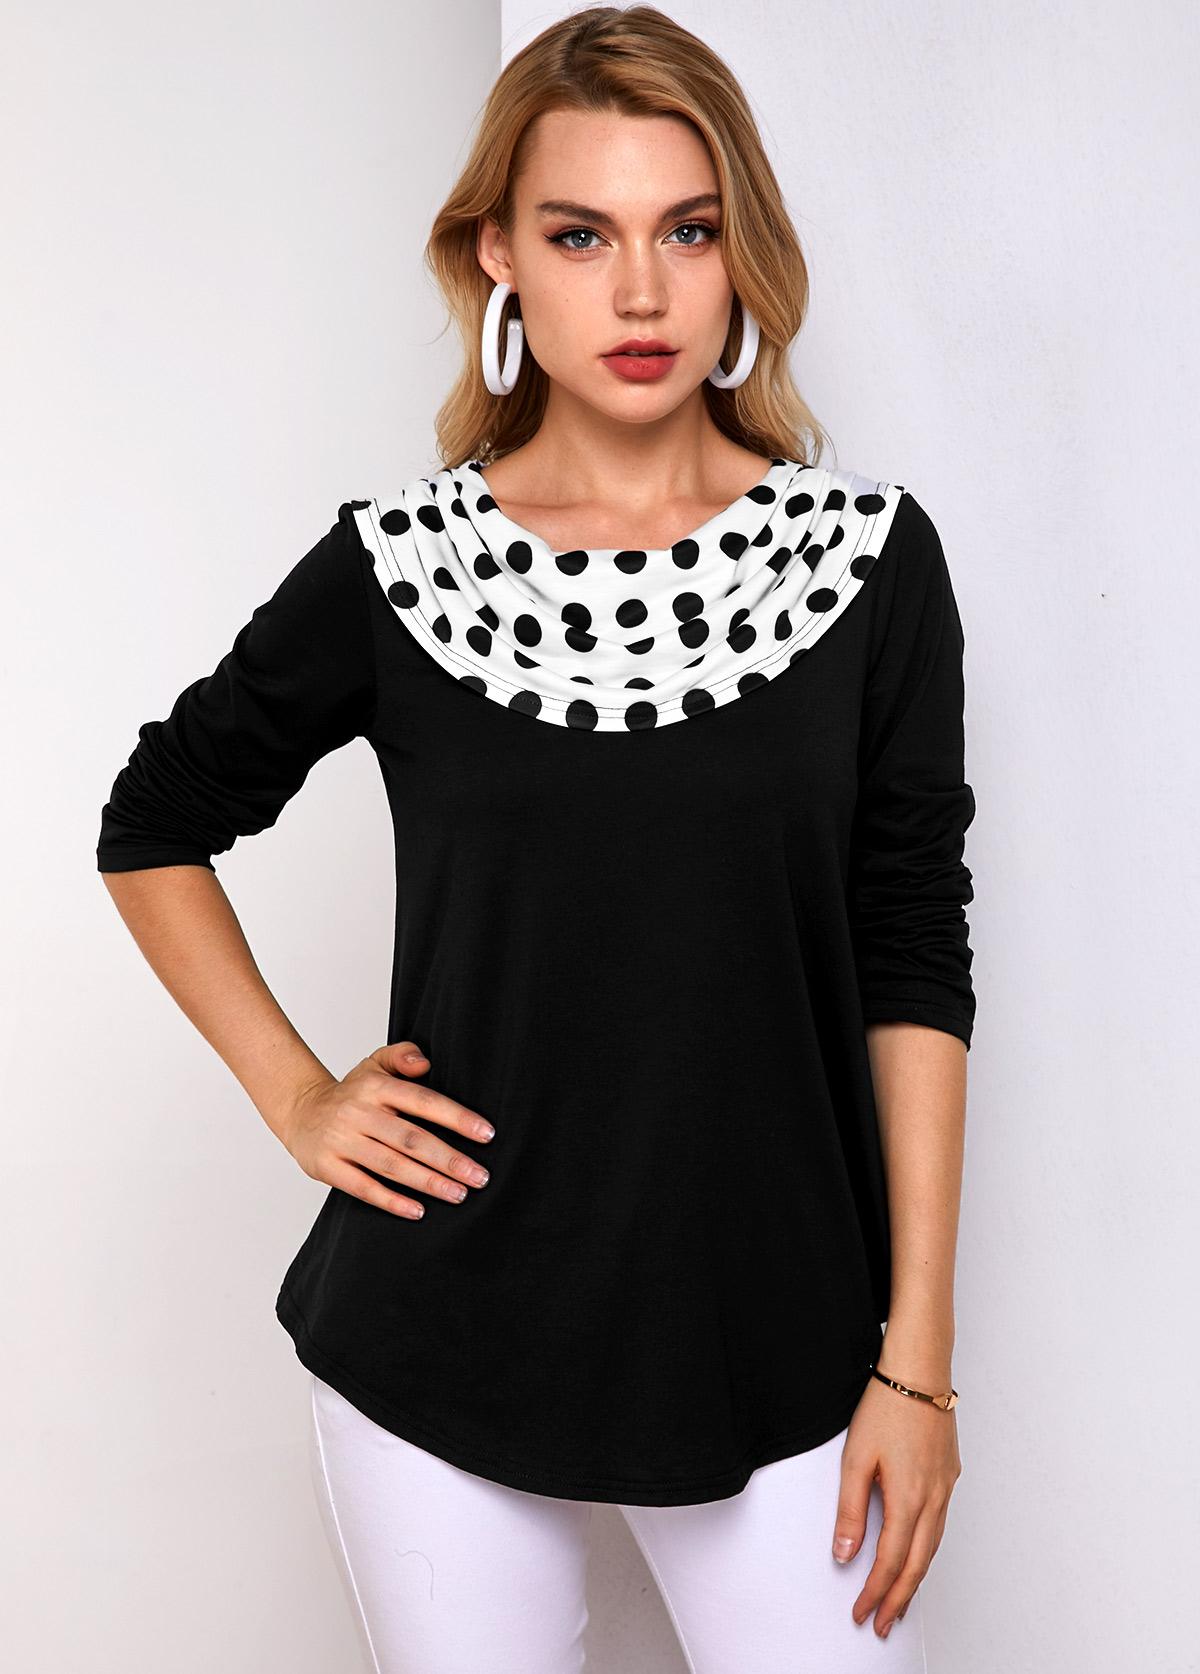 ROTITA Polka Dot Black Long Sleeve T Shirt